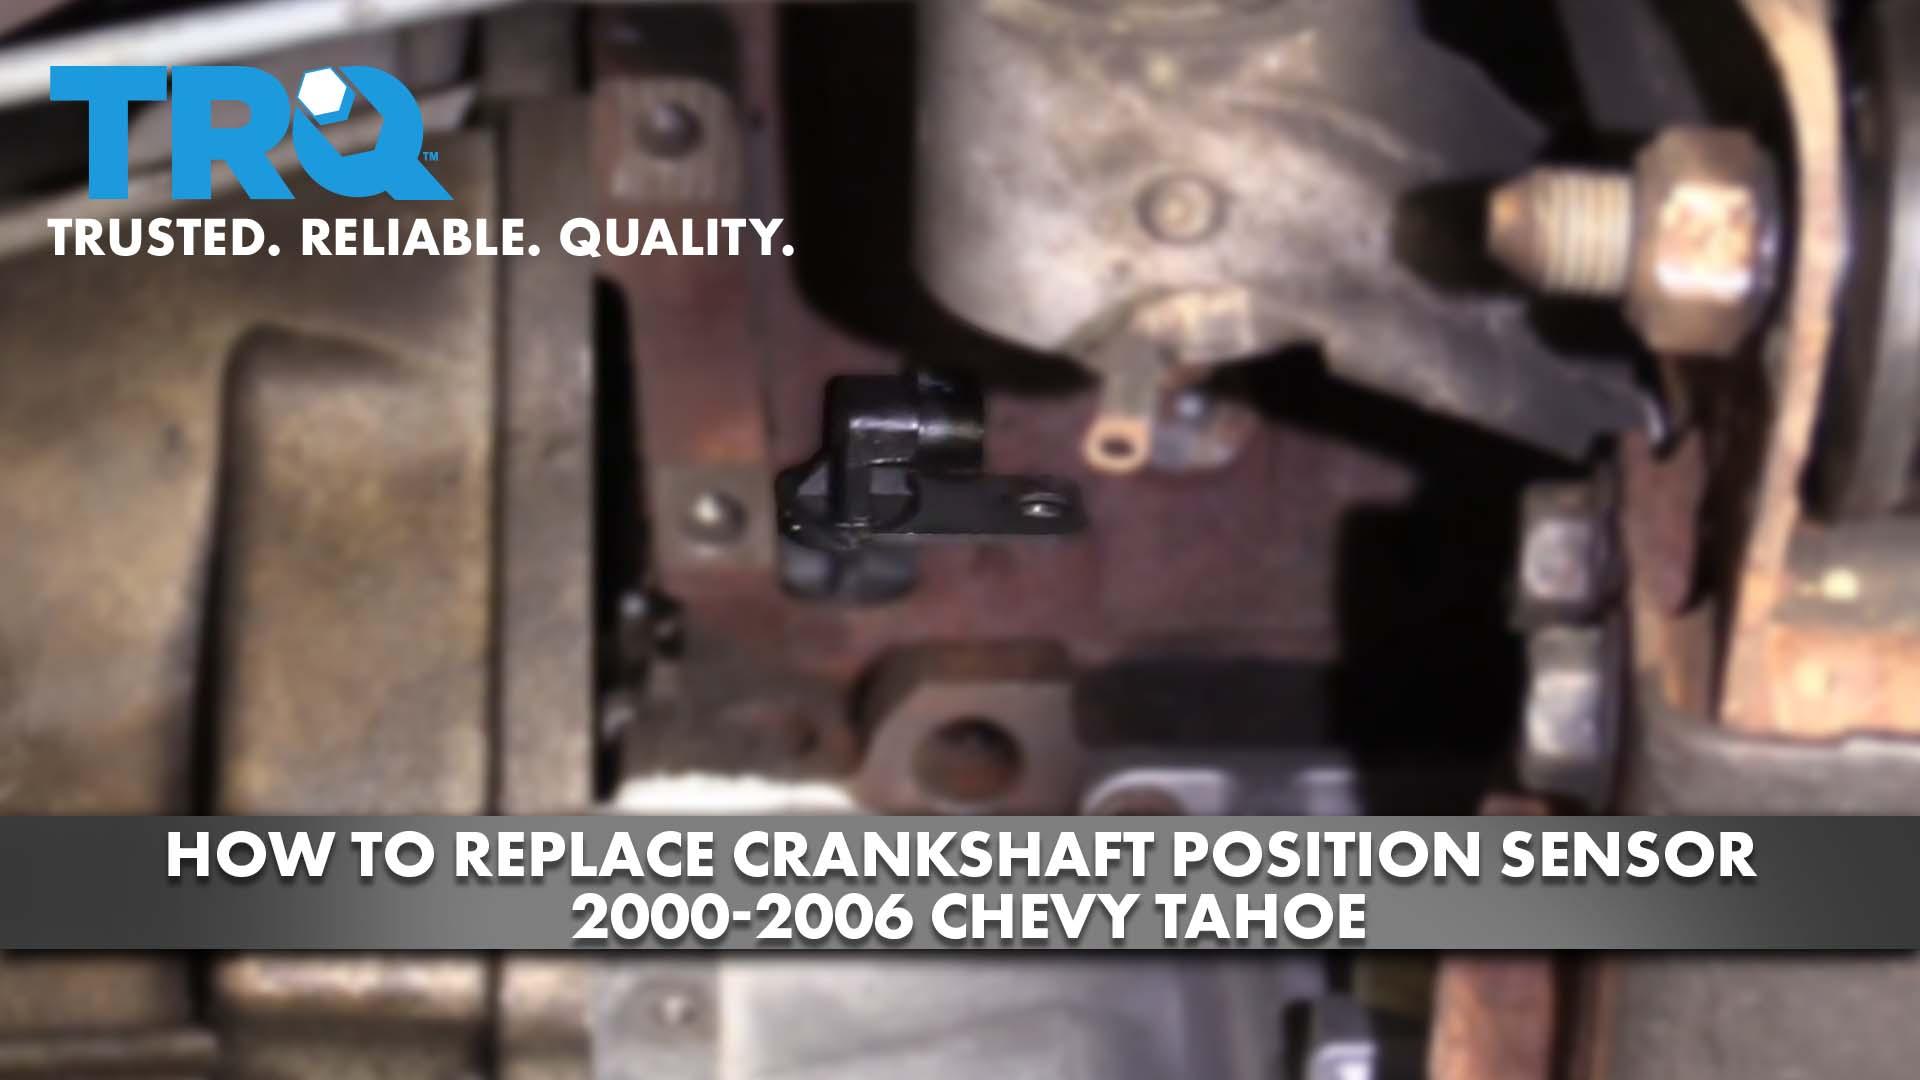 How To Replace Crankshaft Position Sensor 2000-06 Chevy Tahoe